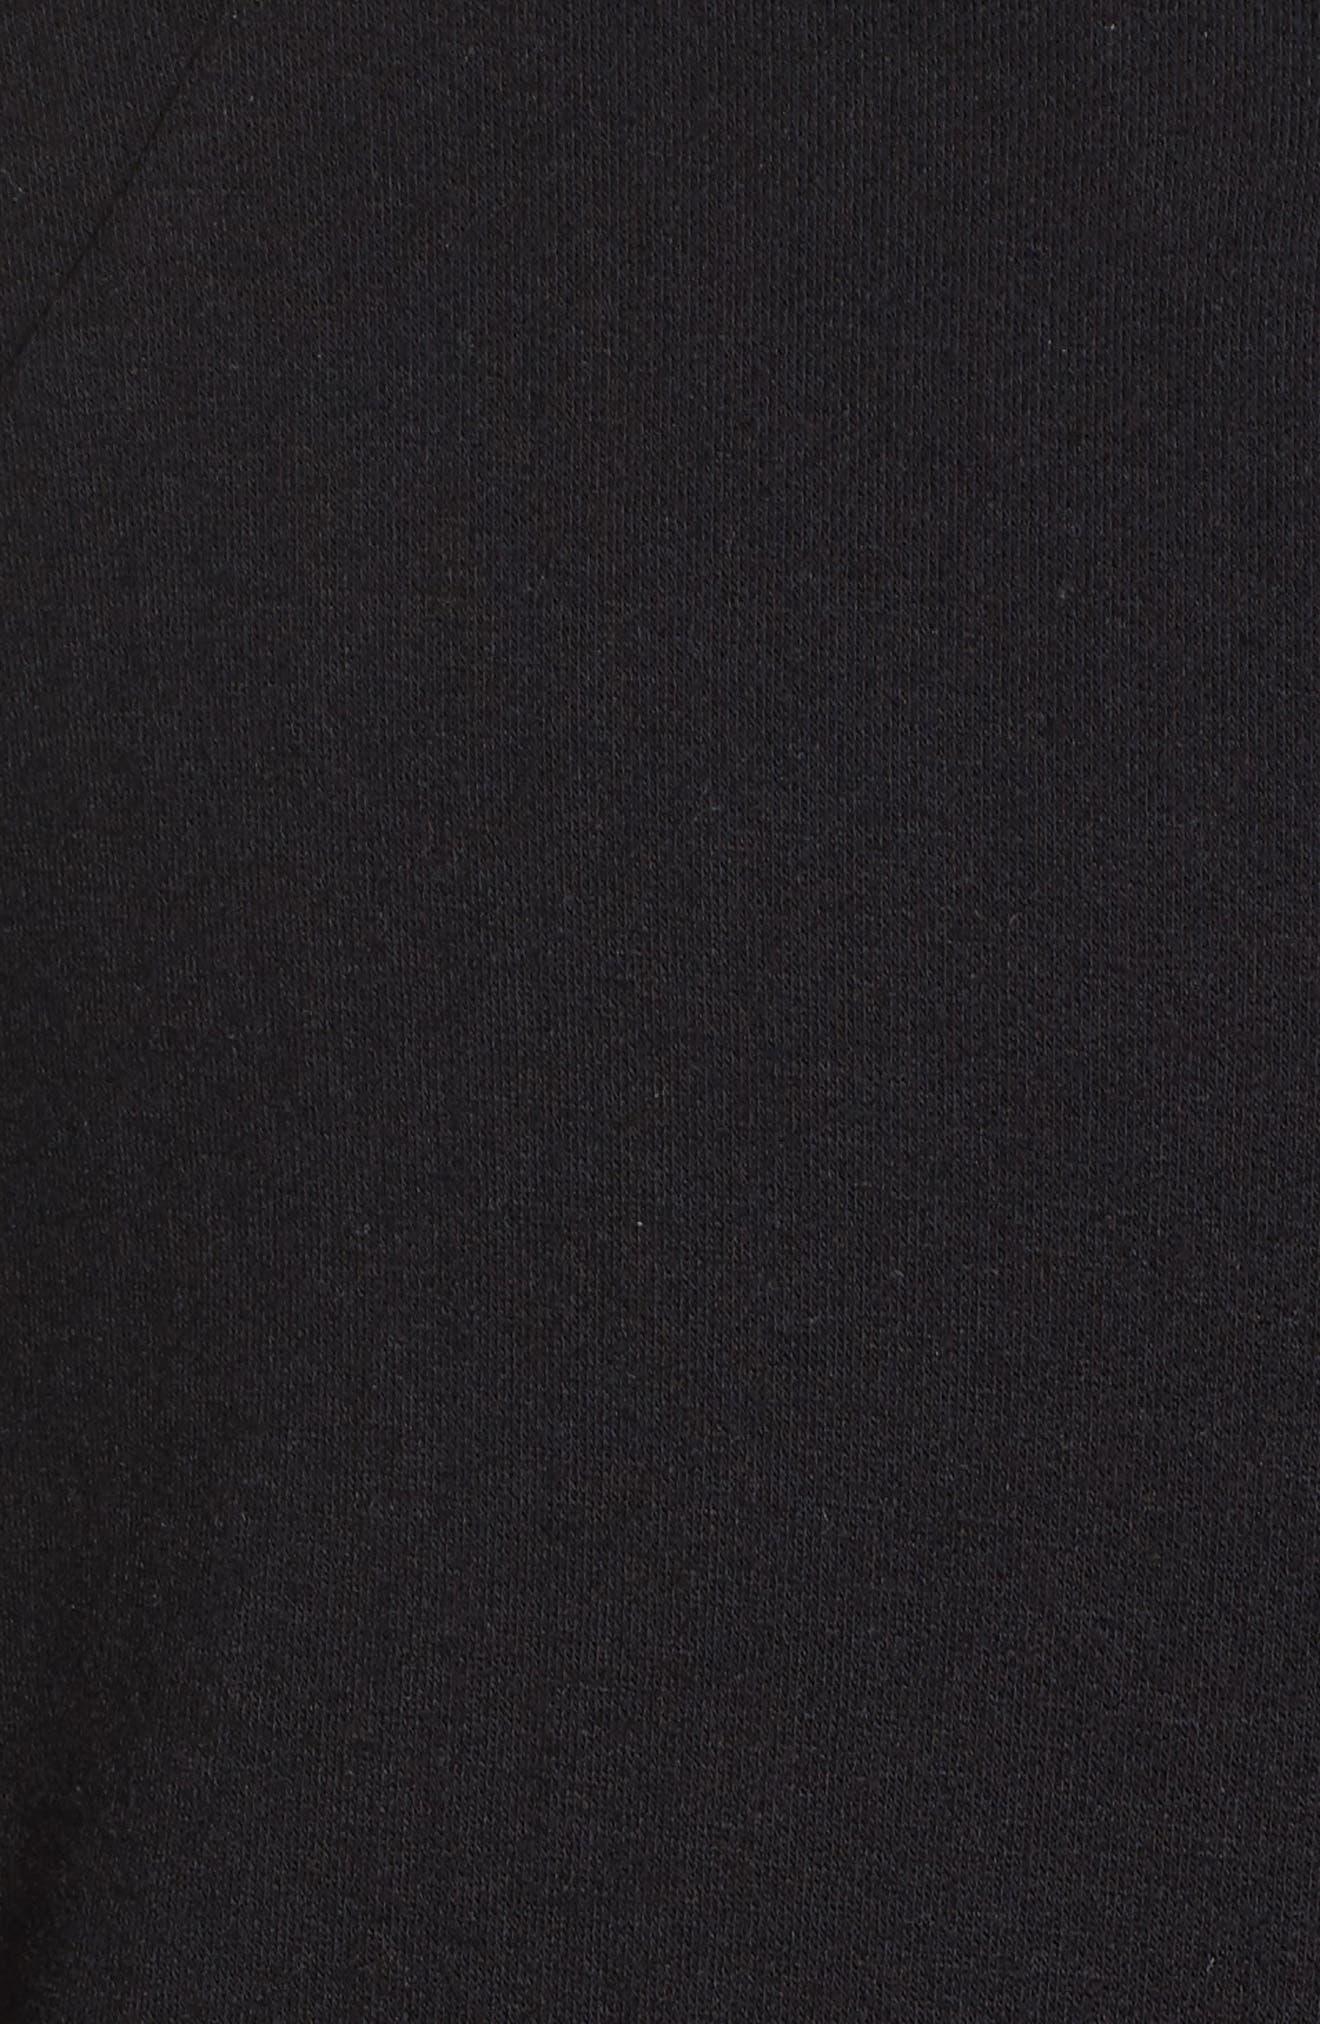 Snap Me Down Pullover,                             Alternate thumbnail 6, color,                             Black